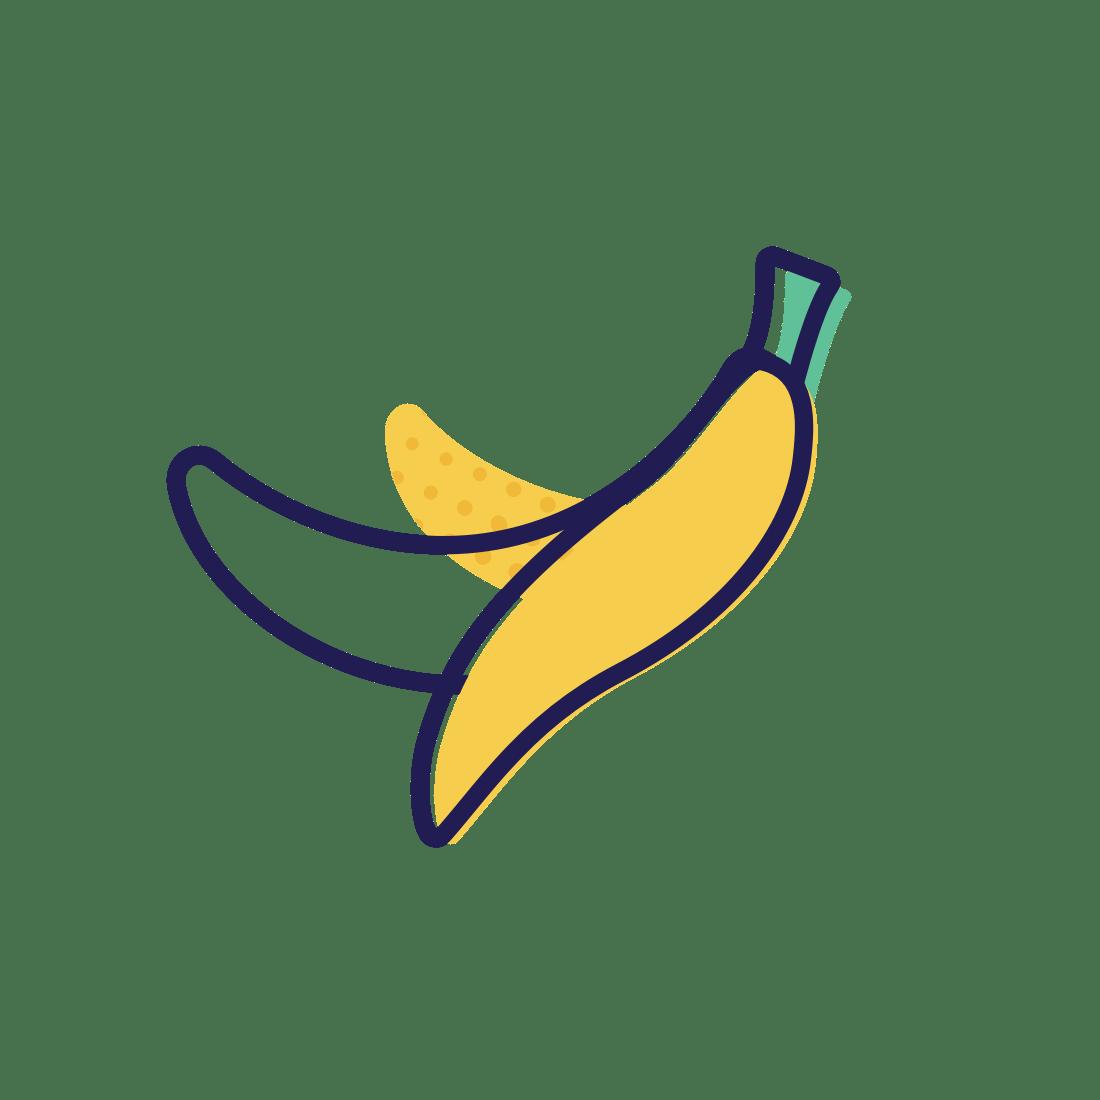 hight resolution of banana